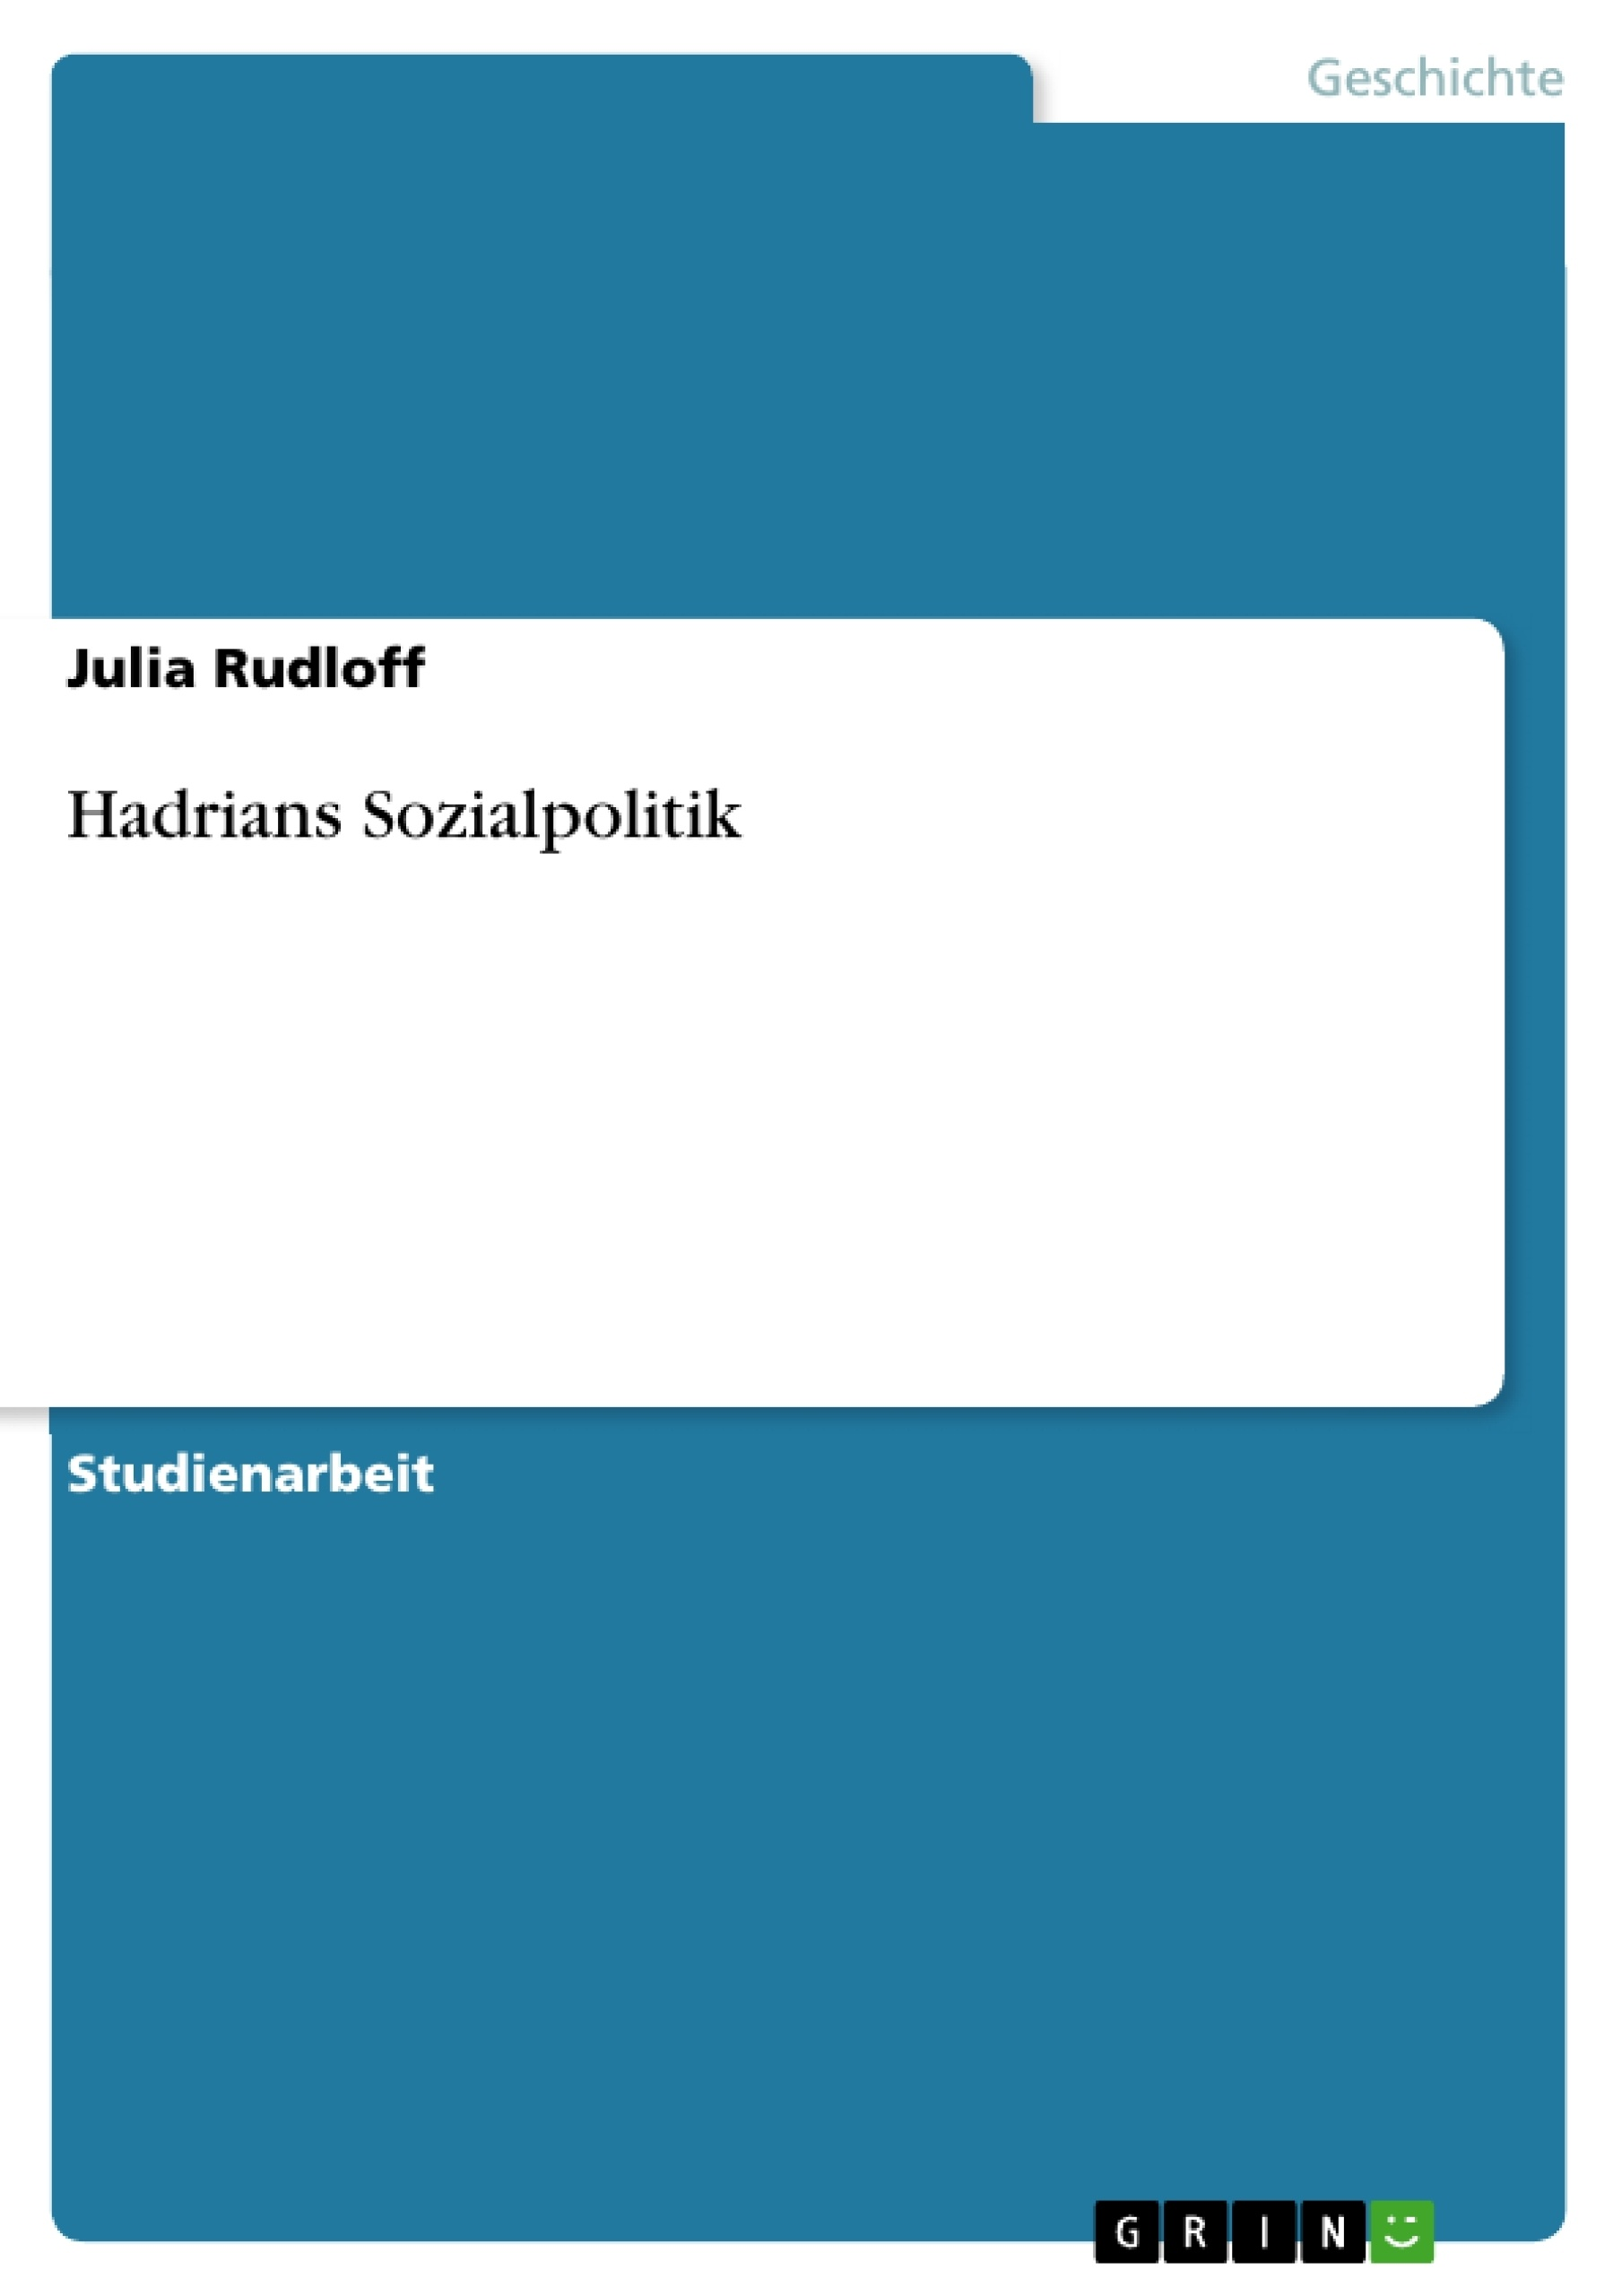 Titel: Hadrians Sozialpolitik